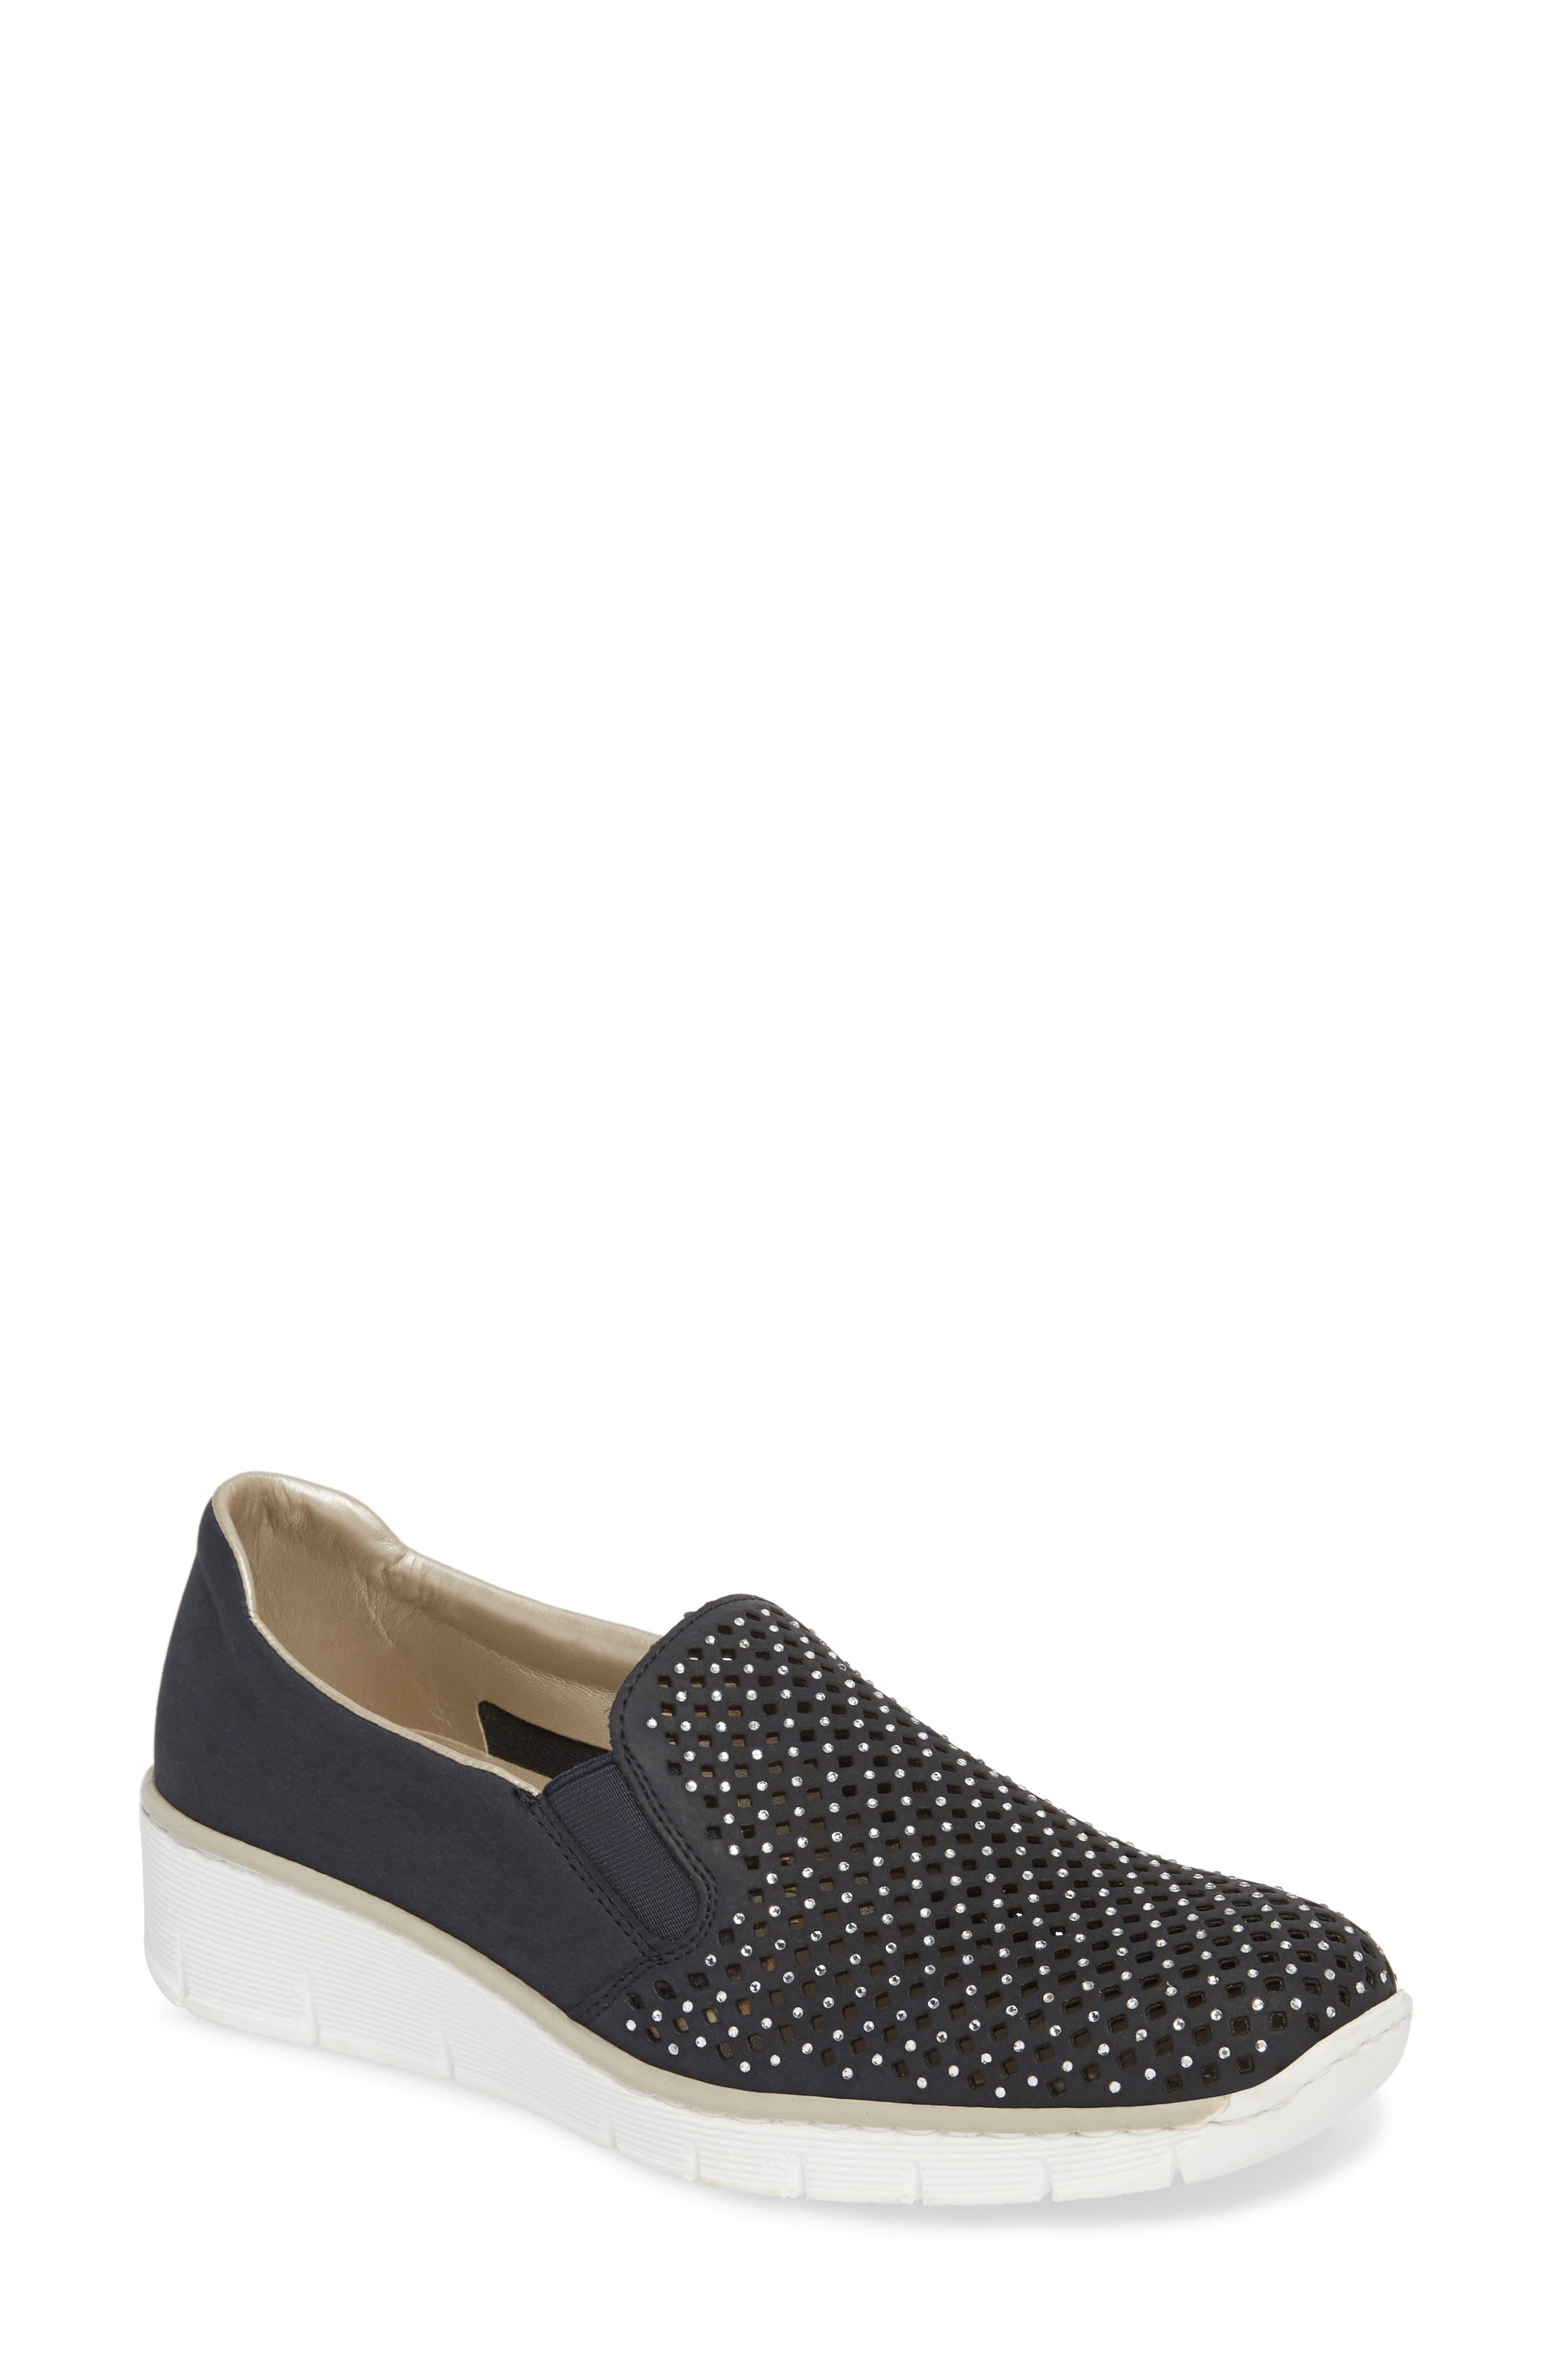 Doris A6 Wedge Sneaker,                             Main thumbnail 1, color,                             401